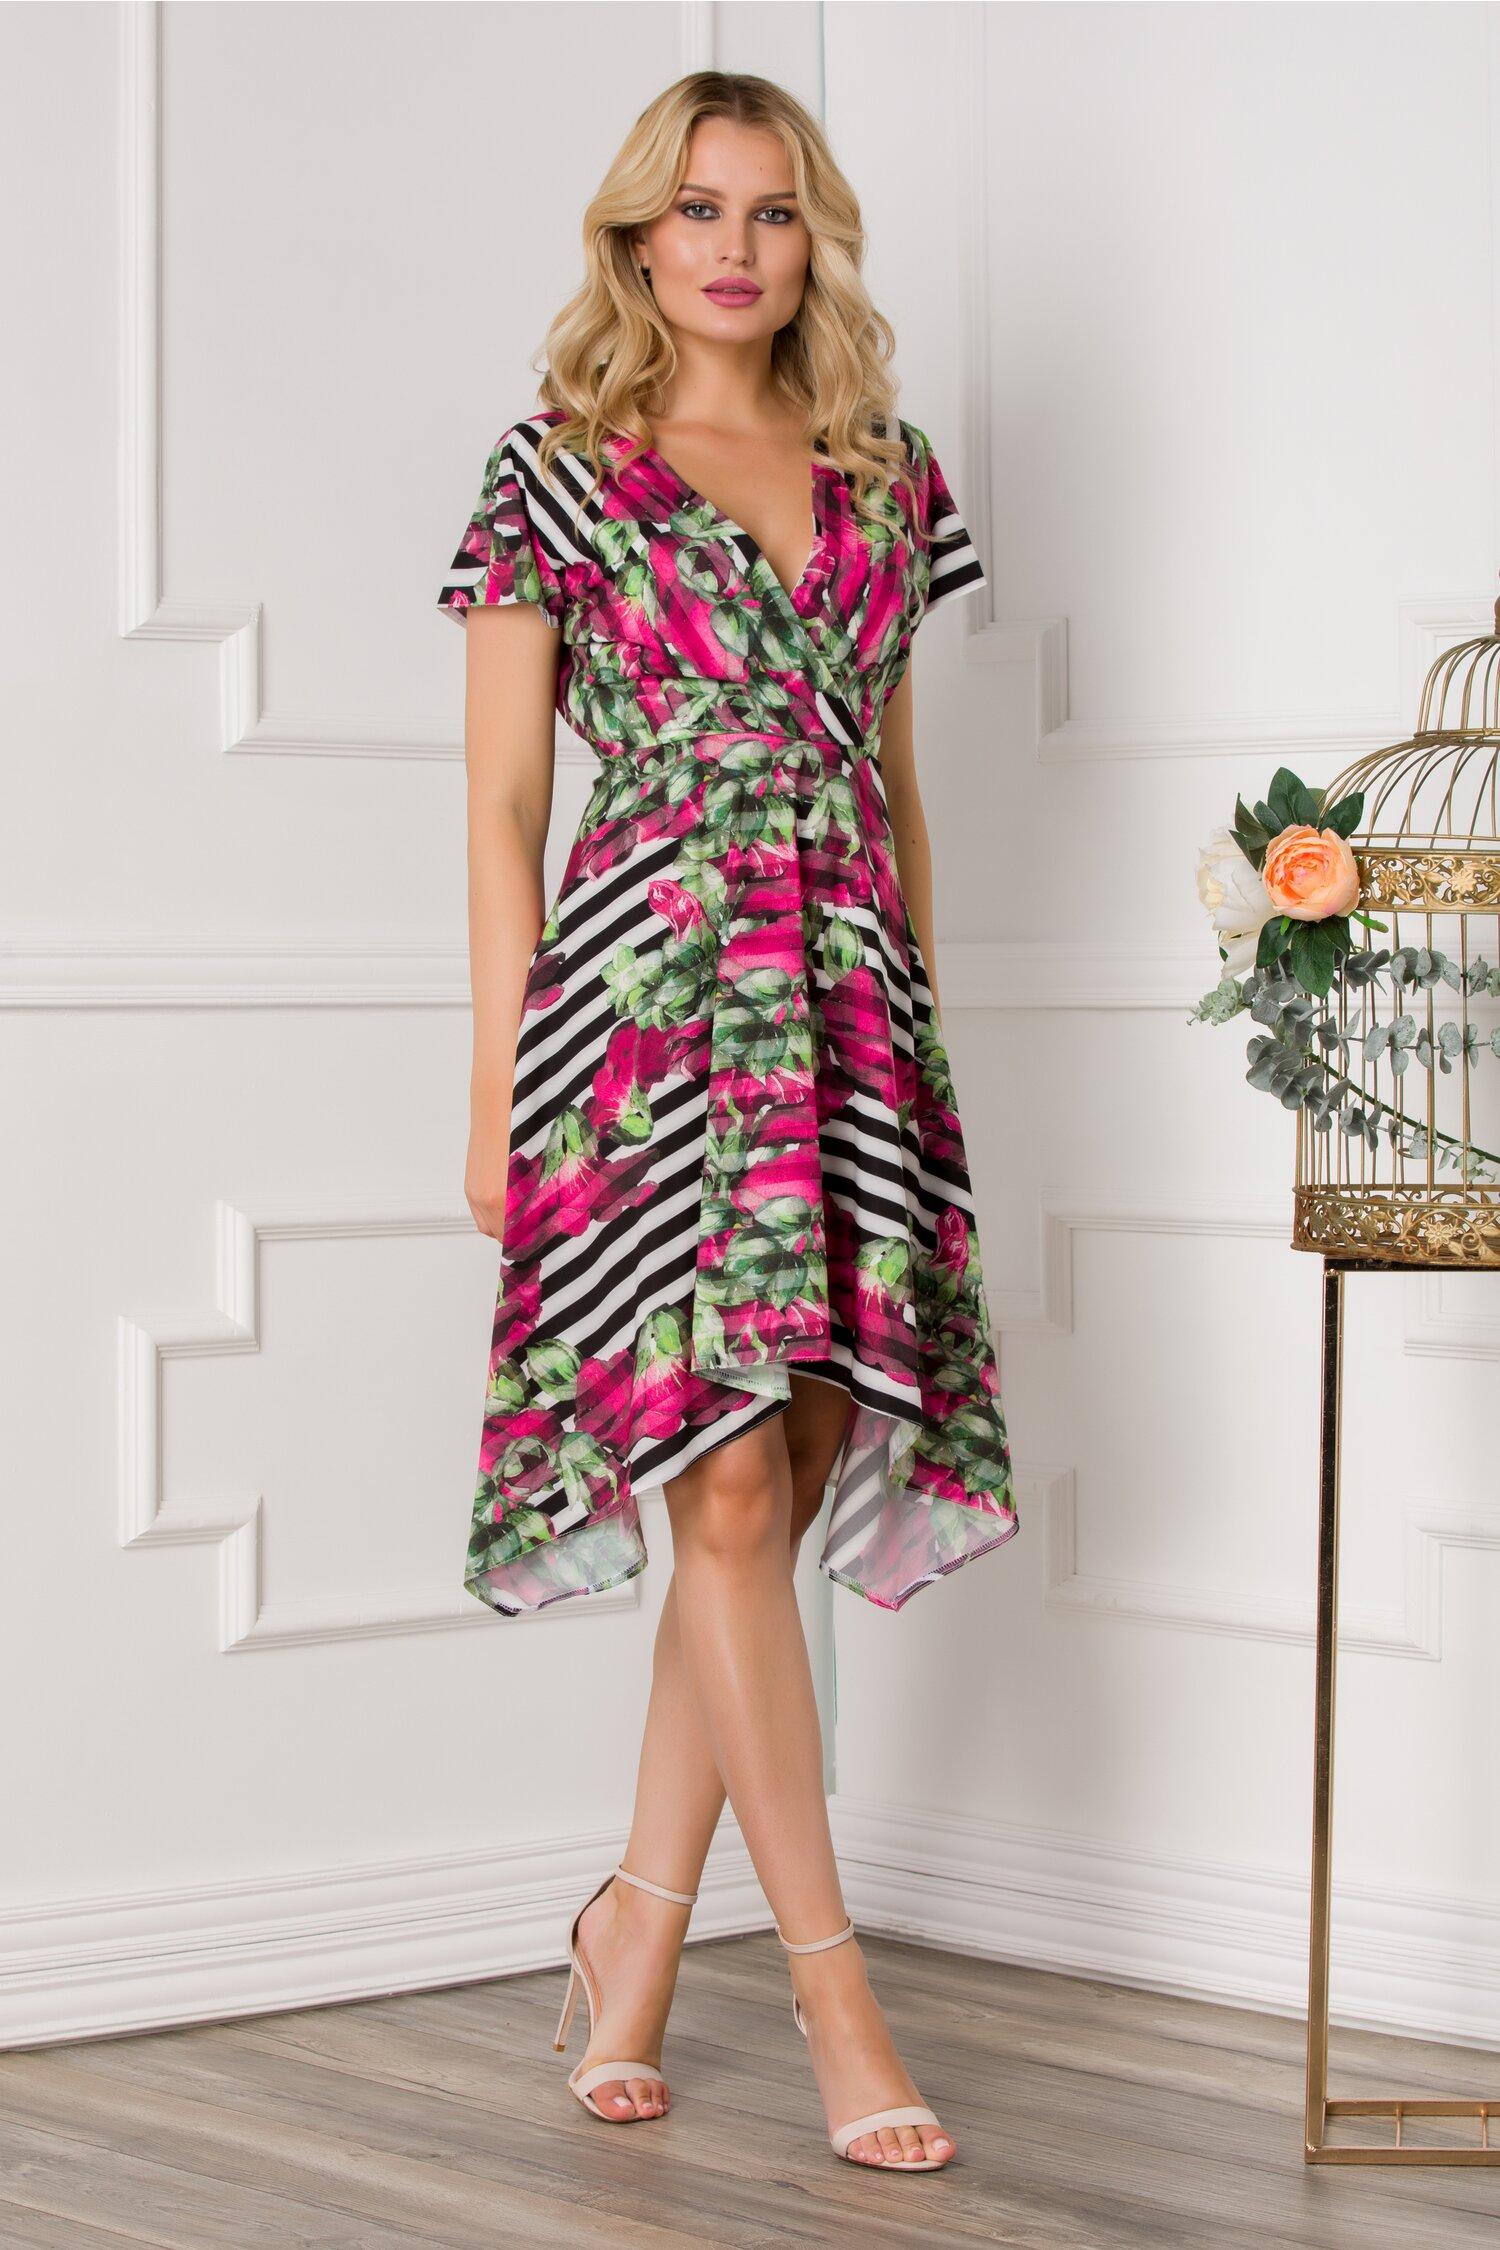 rochie moze cu dungi si imprimeu floral in nuante de fucsia 534927 4